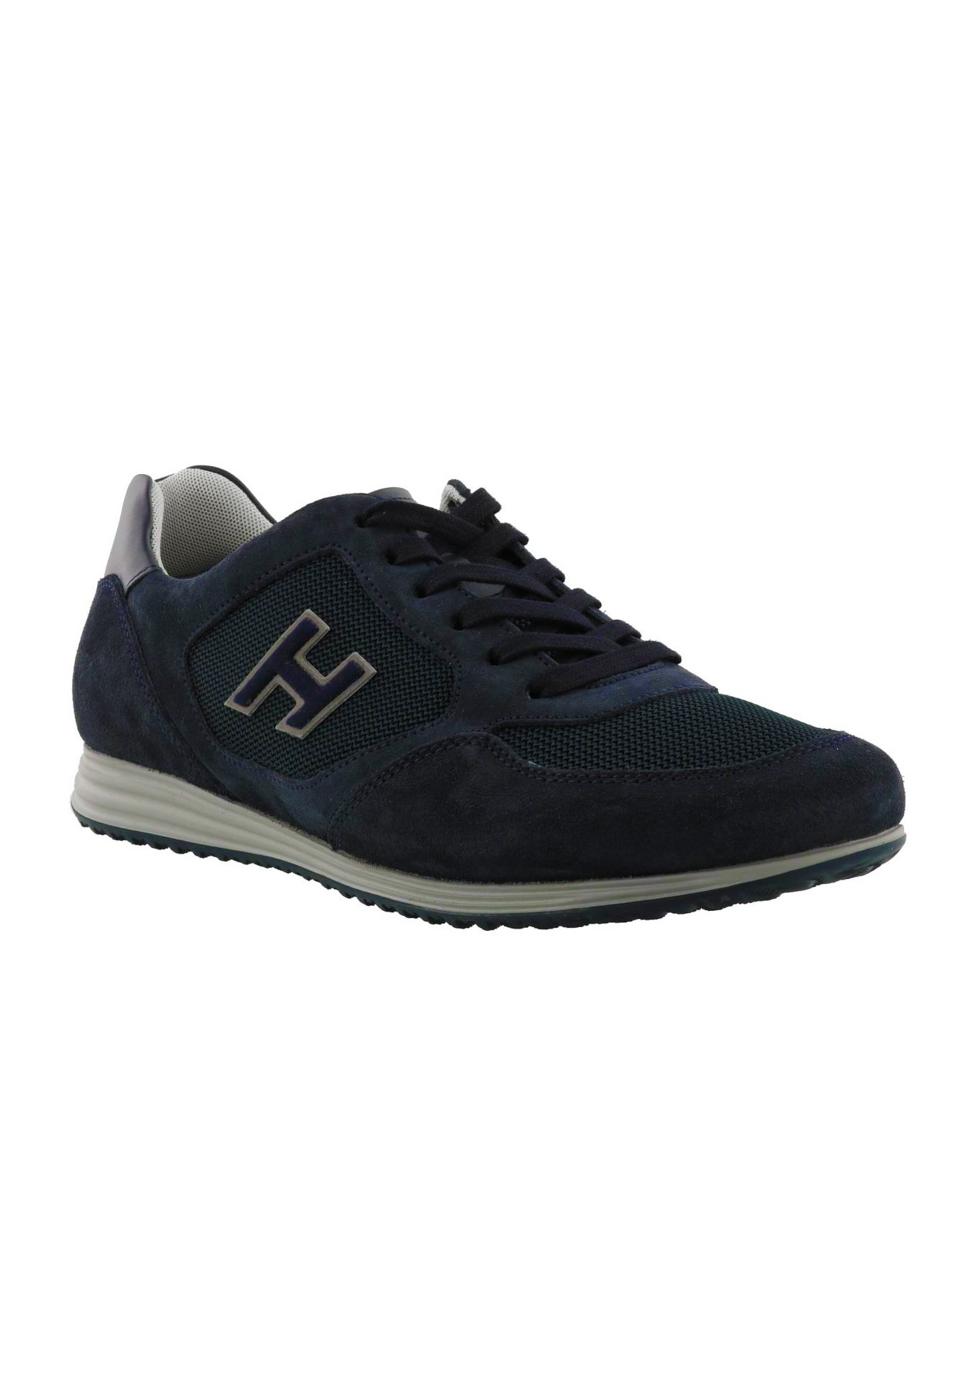 Hogan Sneakers fashion da uomo con punta arrotondata in pelle blu ...